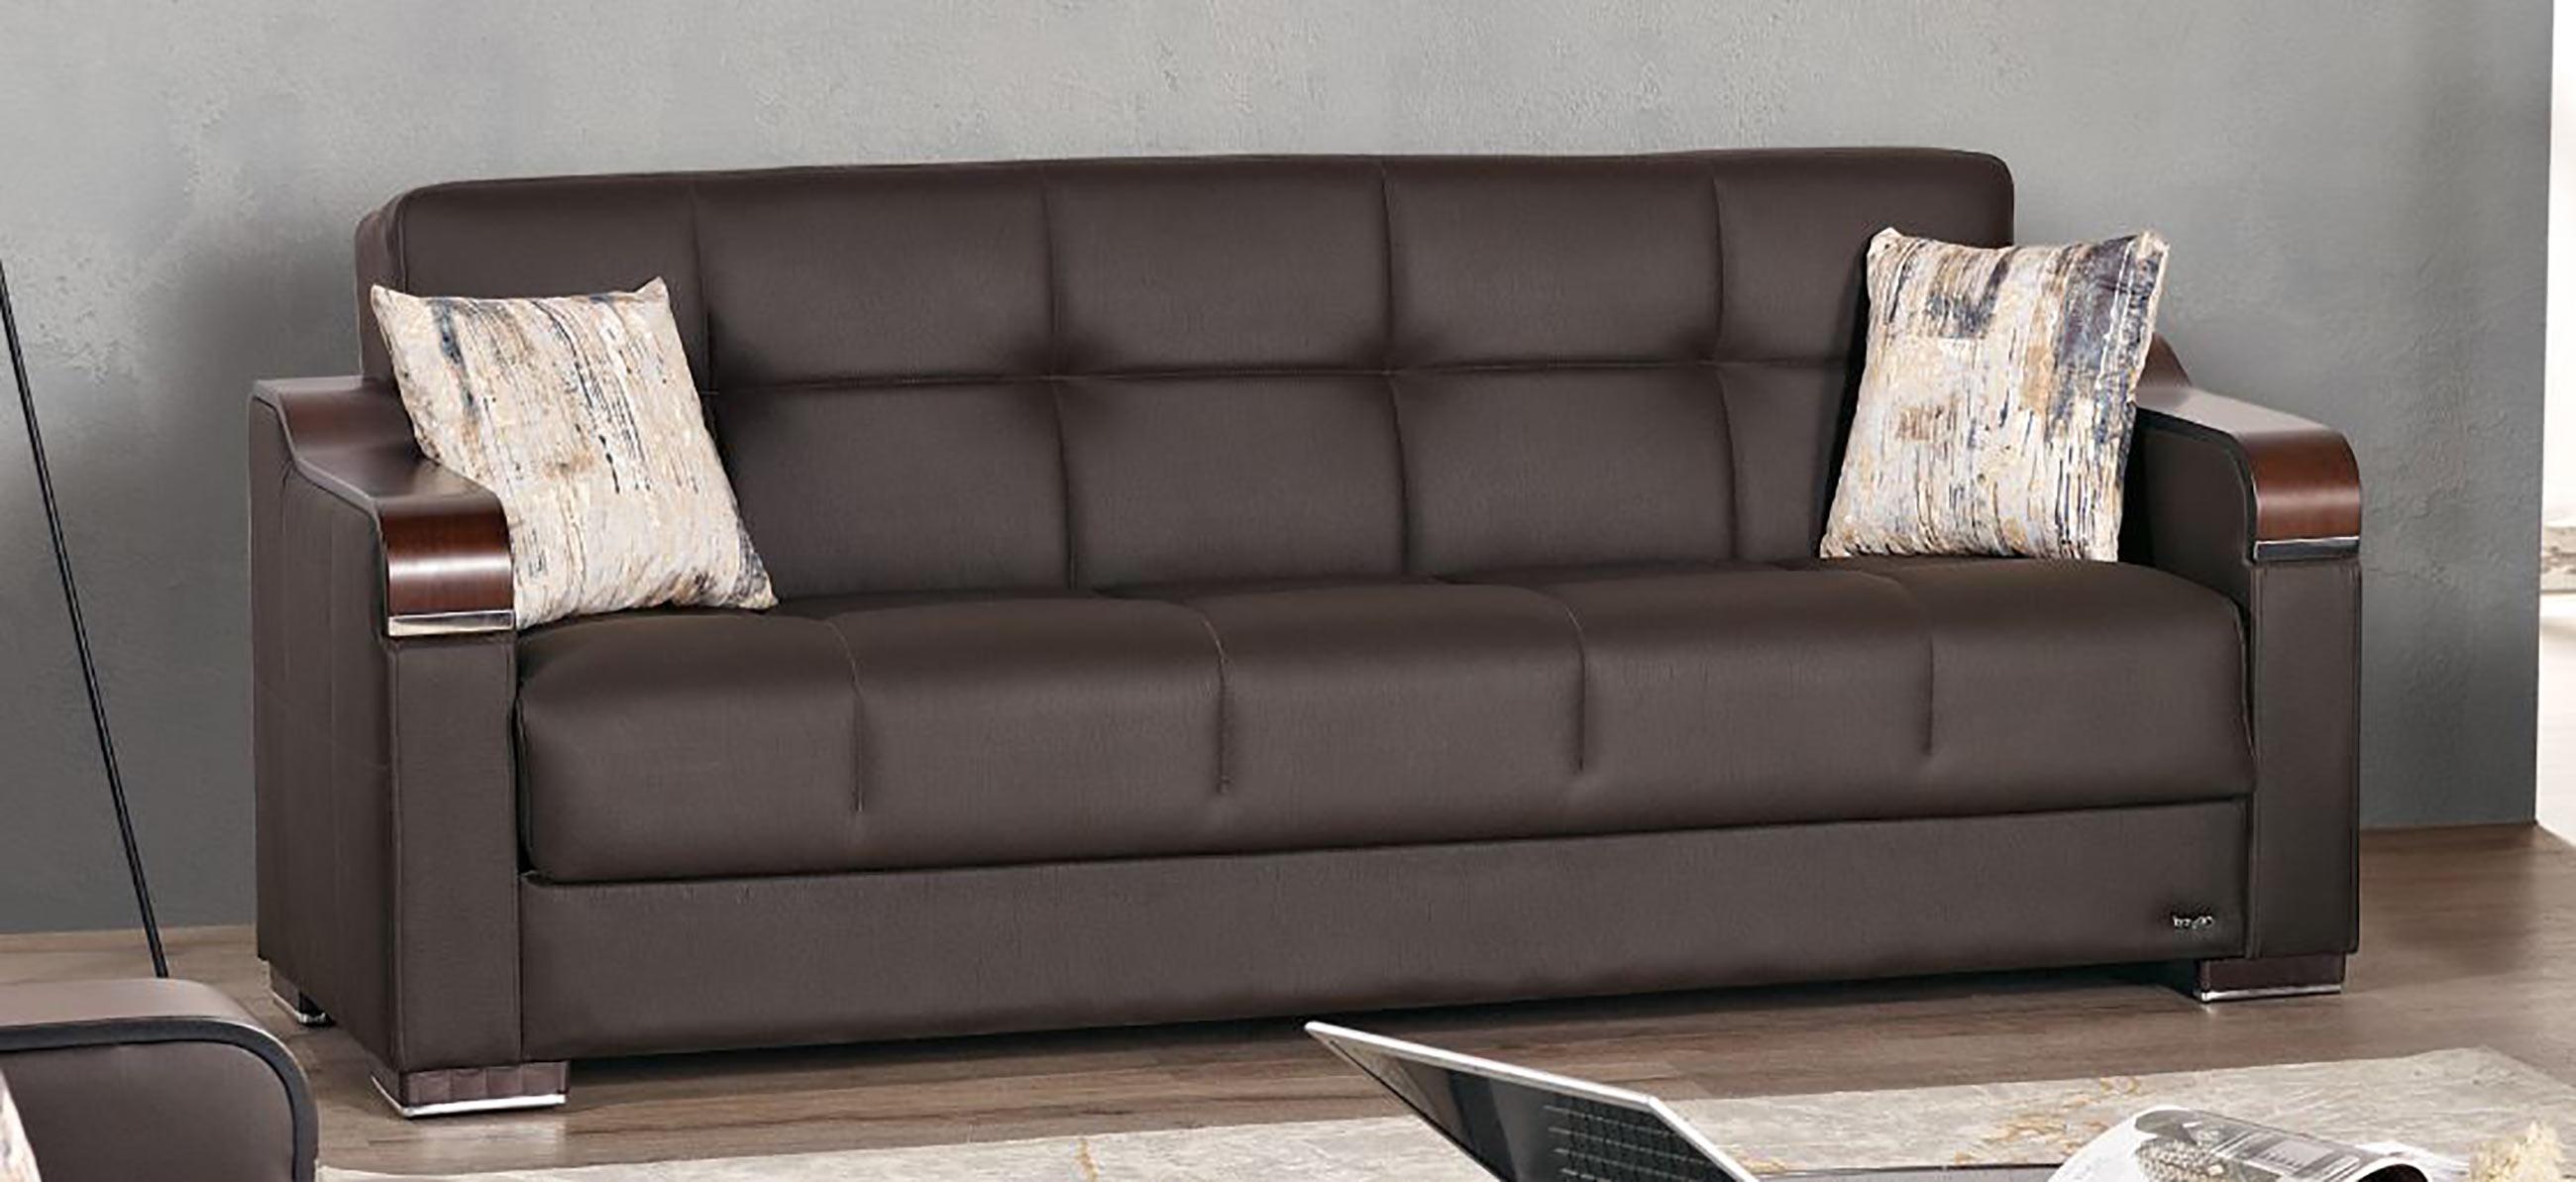 Paramus Dark Brown Fabric Sofa Bed By Empire Furniture Usa